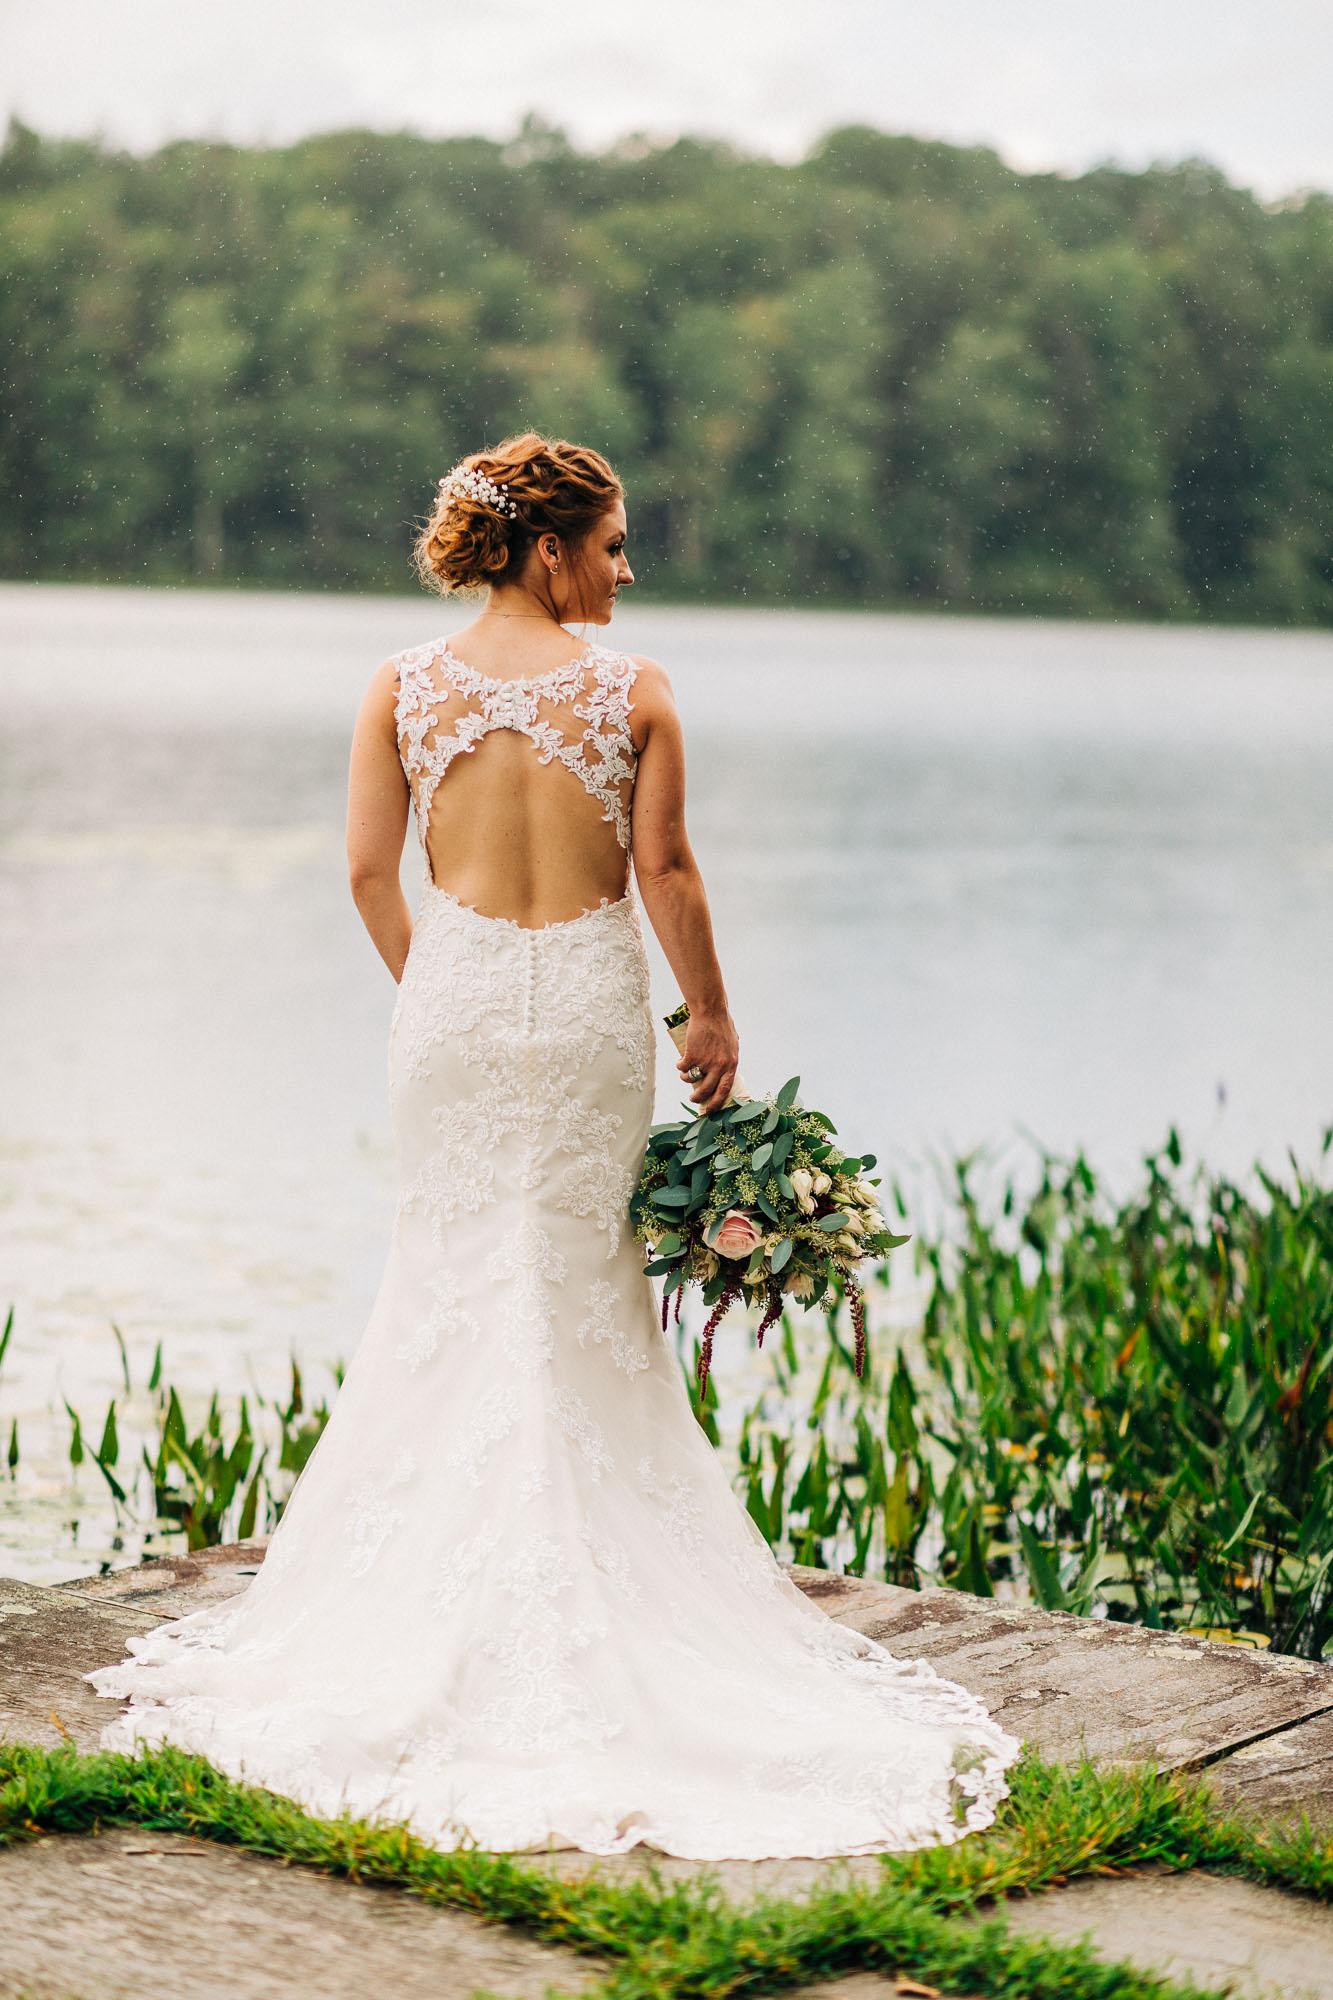 lacawac-sanctuary-wedding-lake-wallenpaupack-9138.jpg